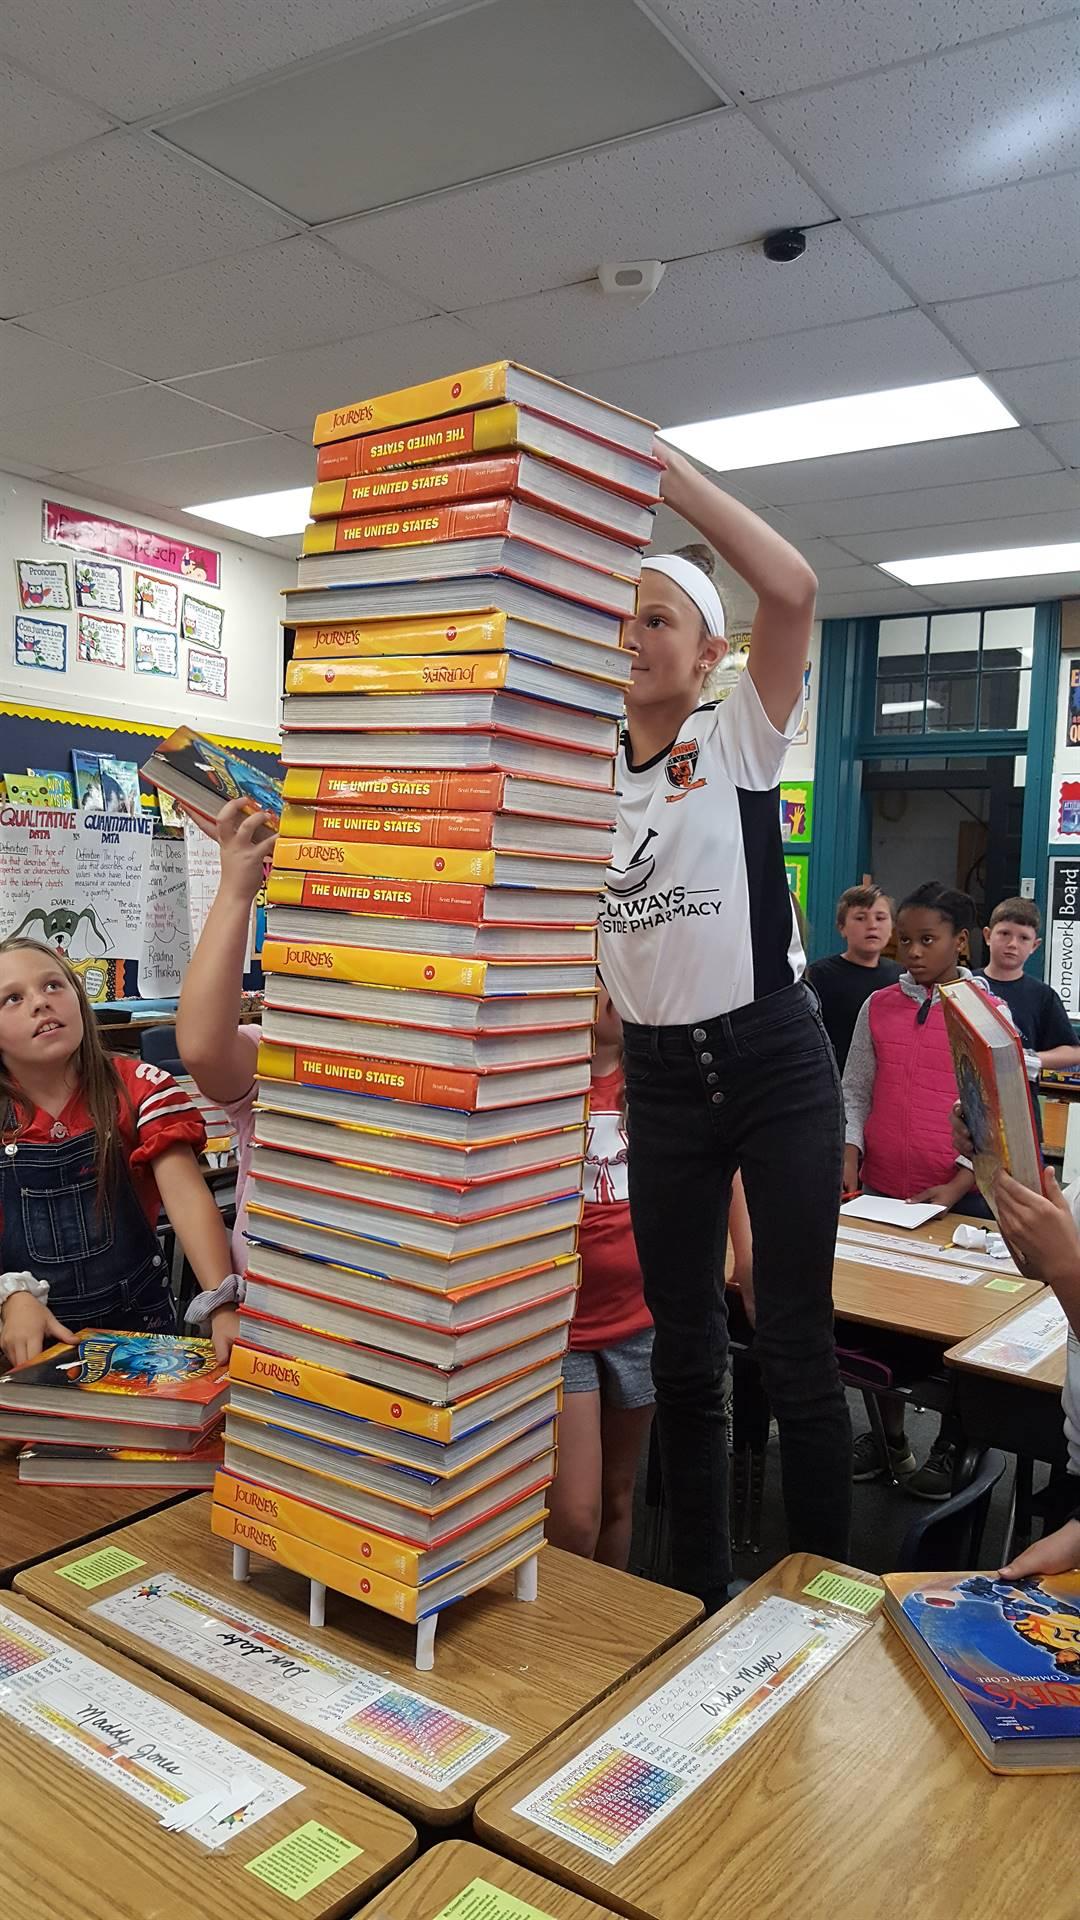 Stacking Books Challenge